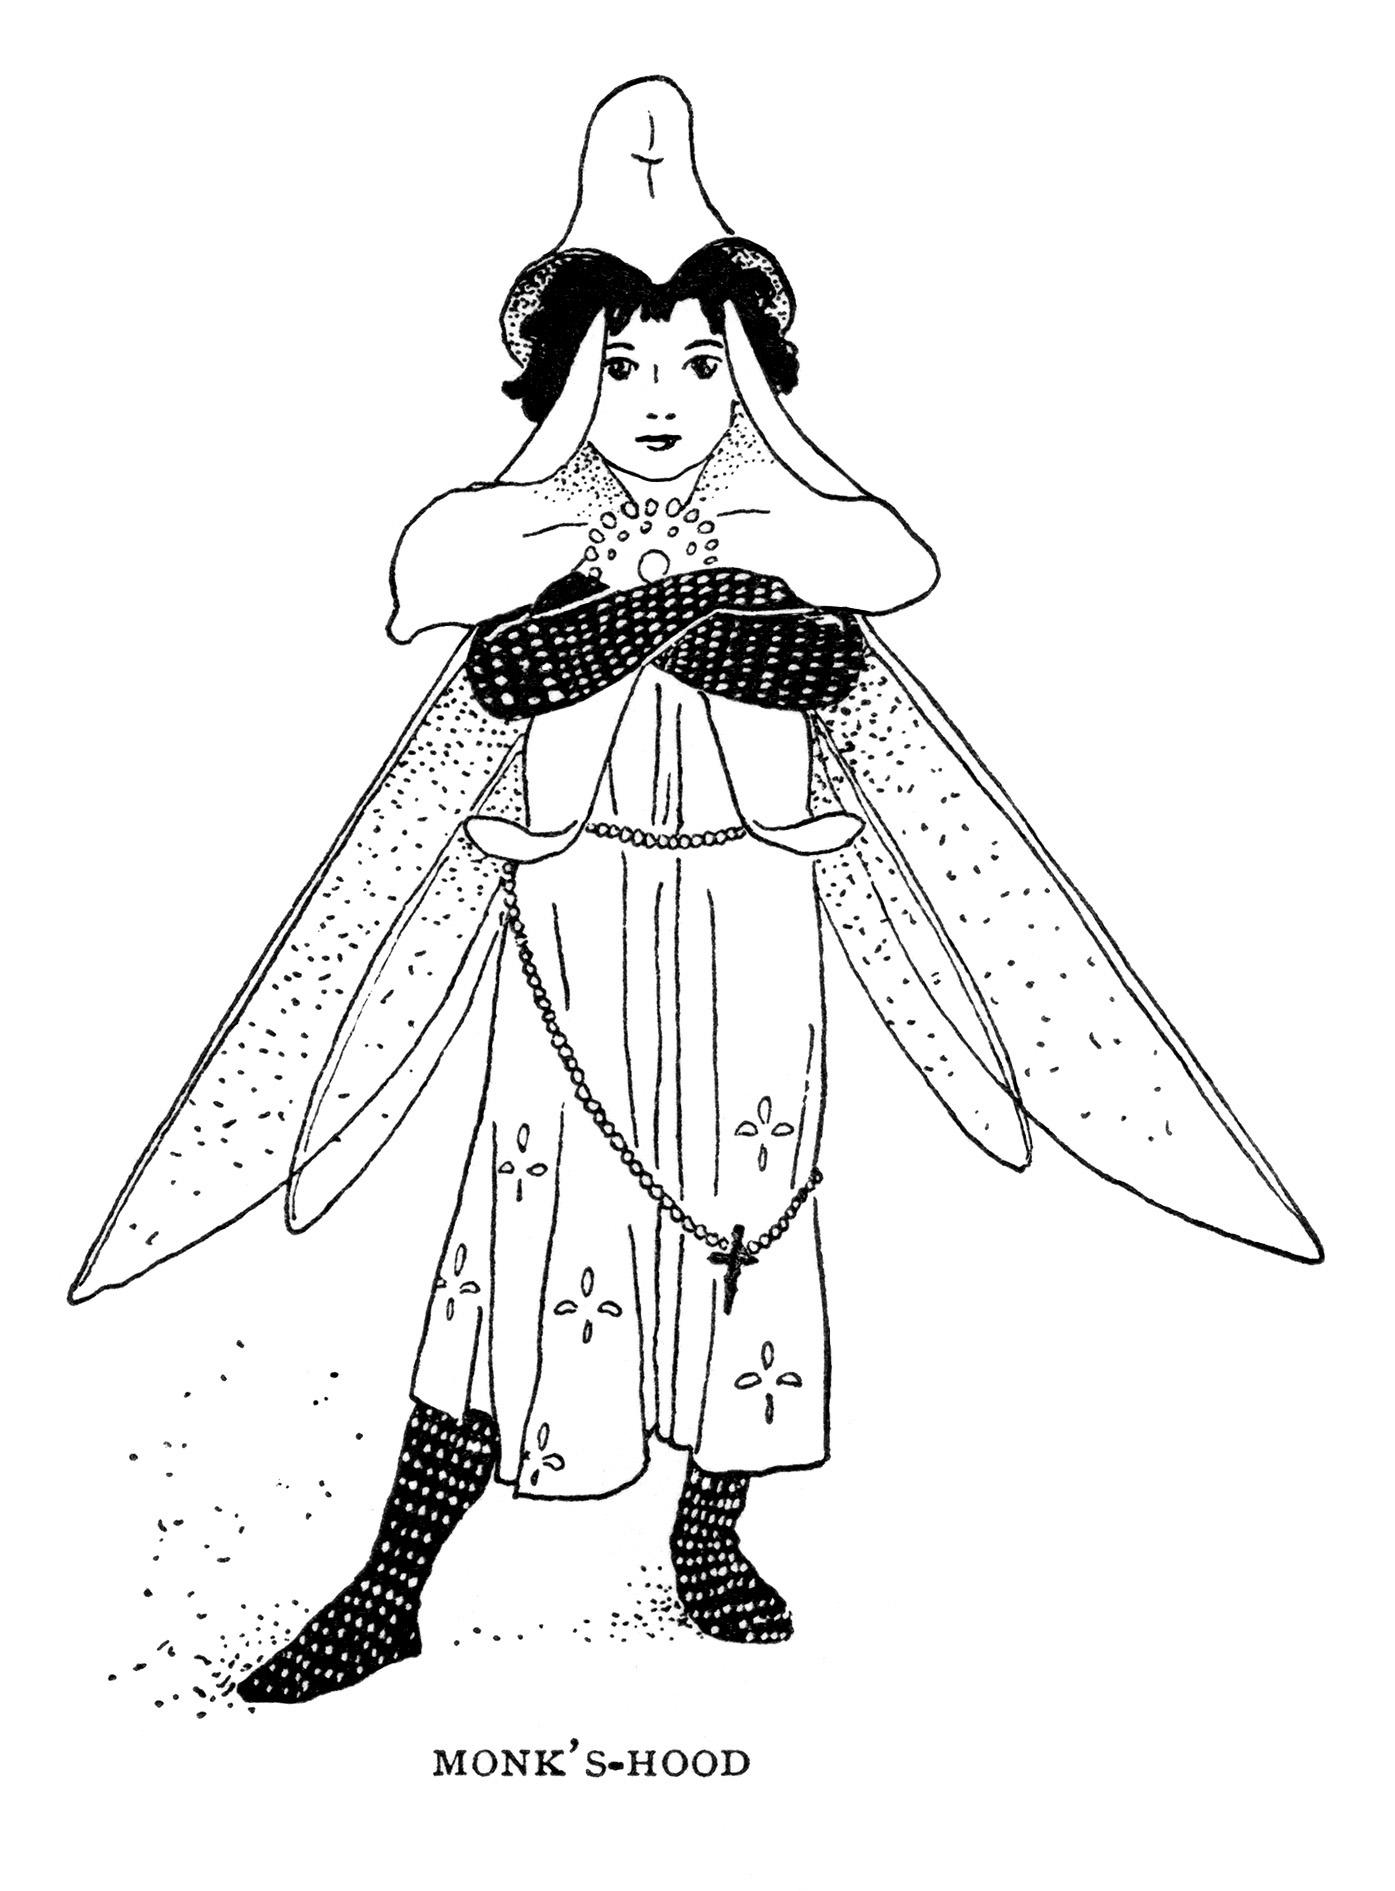 Monk S Hood Storybook Character